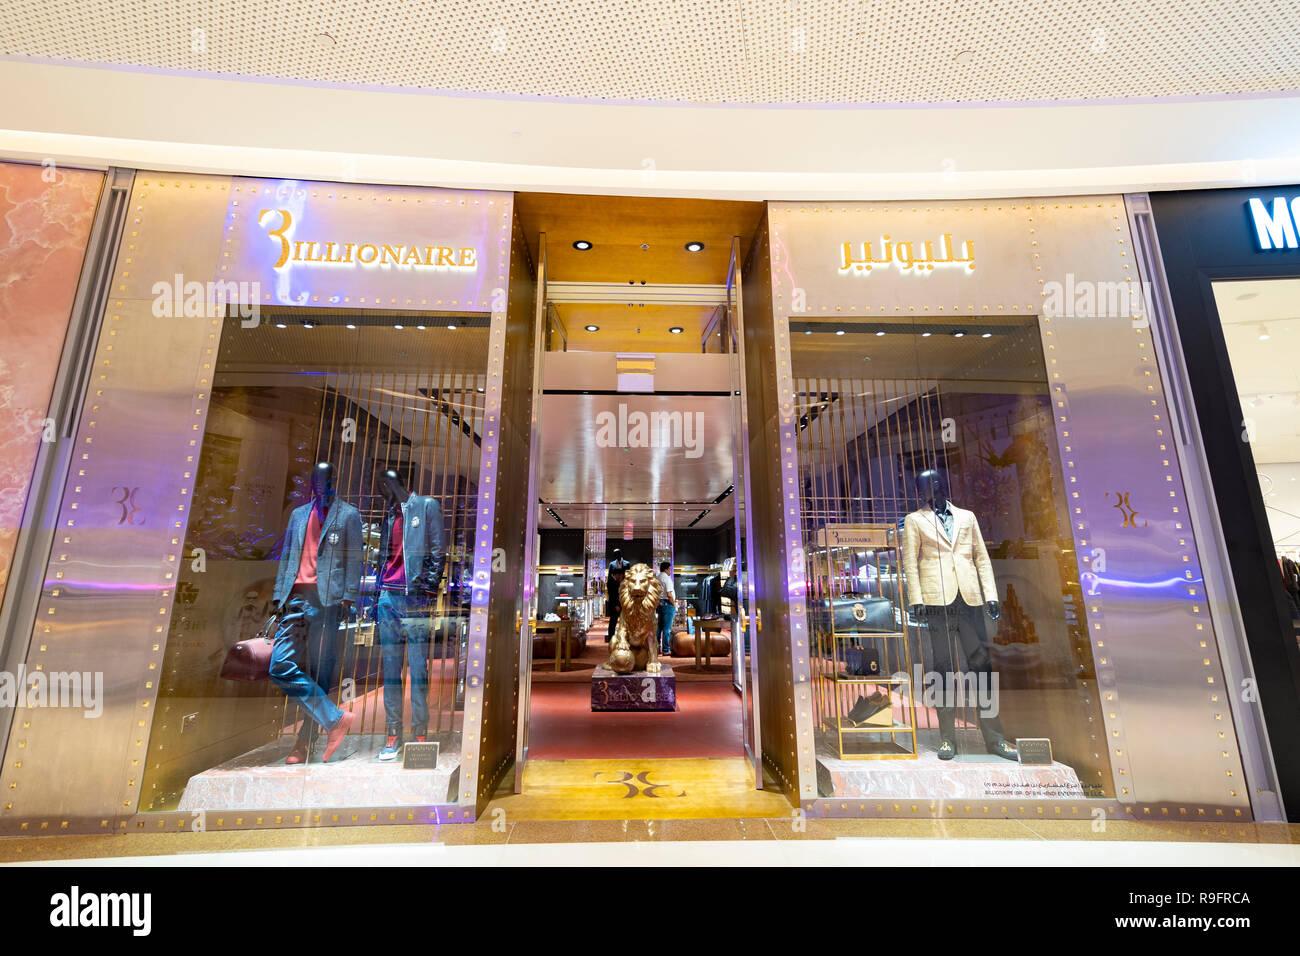 Billionaire boutique at Dubai Mall Fashion Avenue , Downtown Dubai, United Arab Emirates - Stock Image